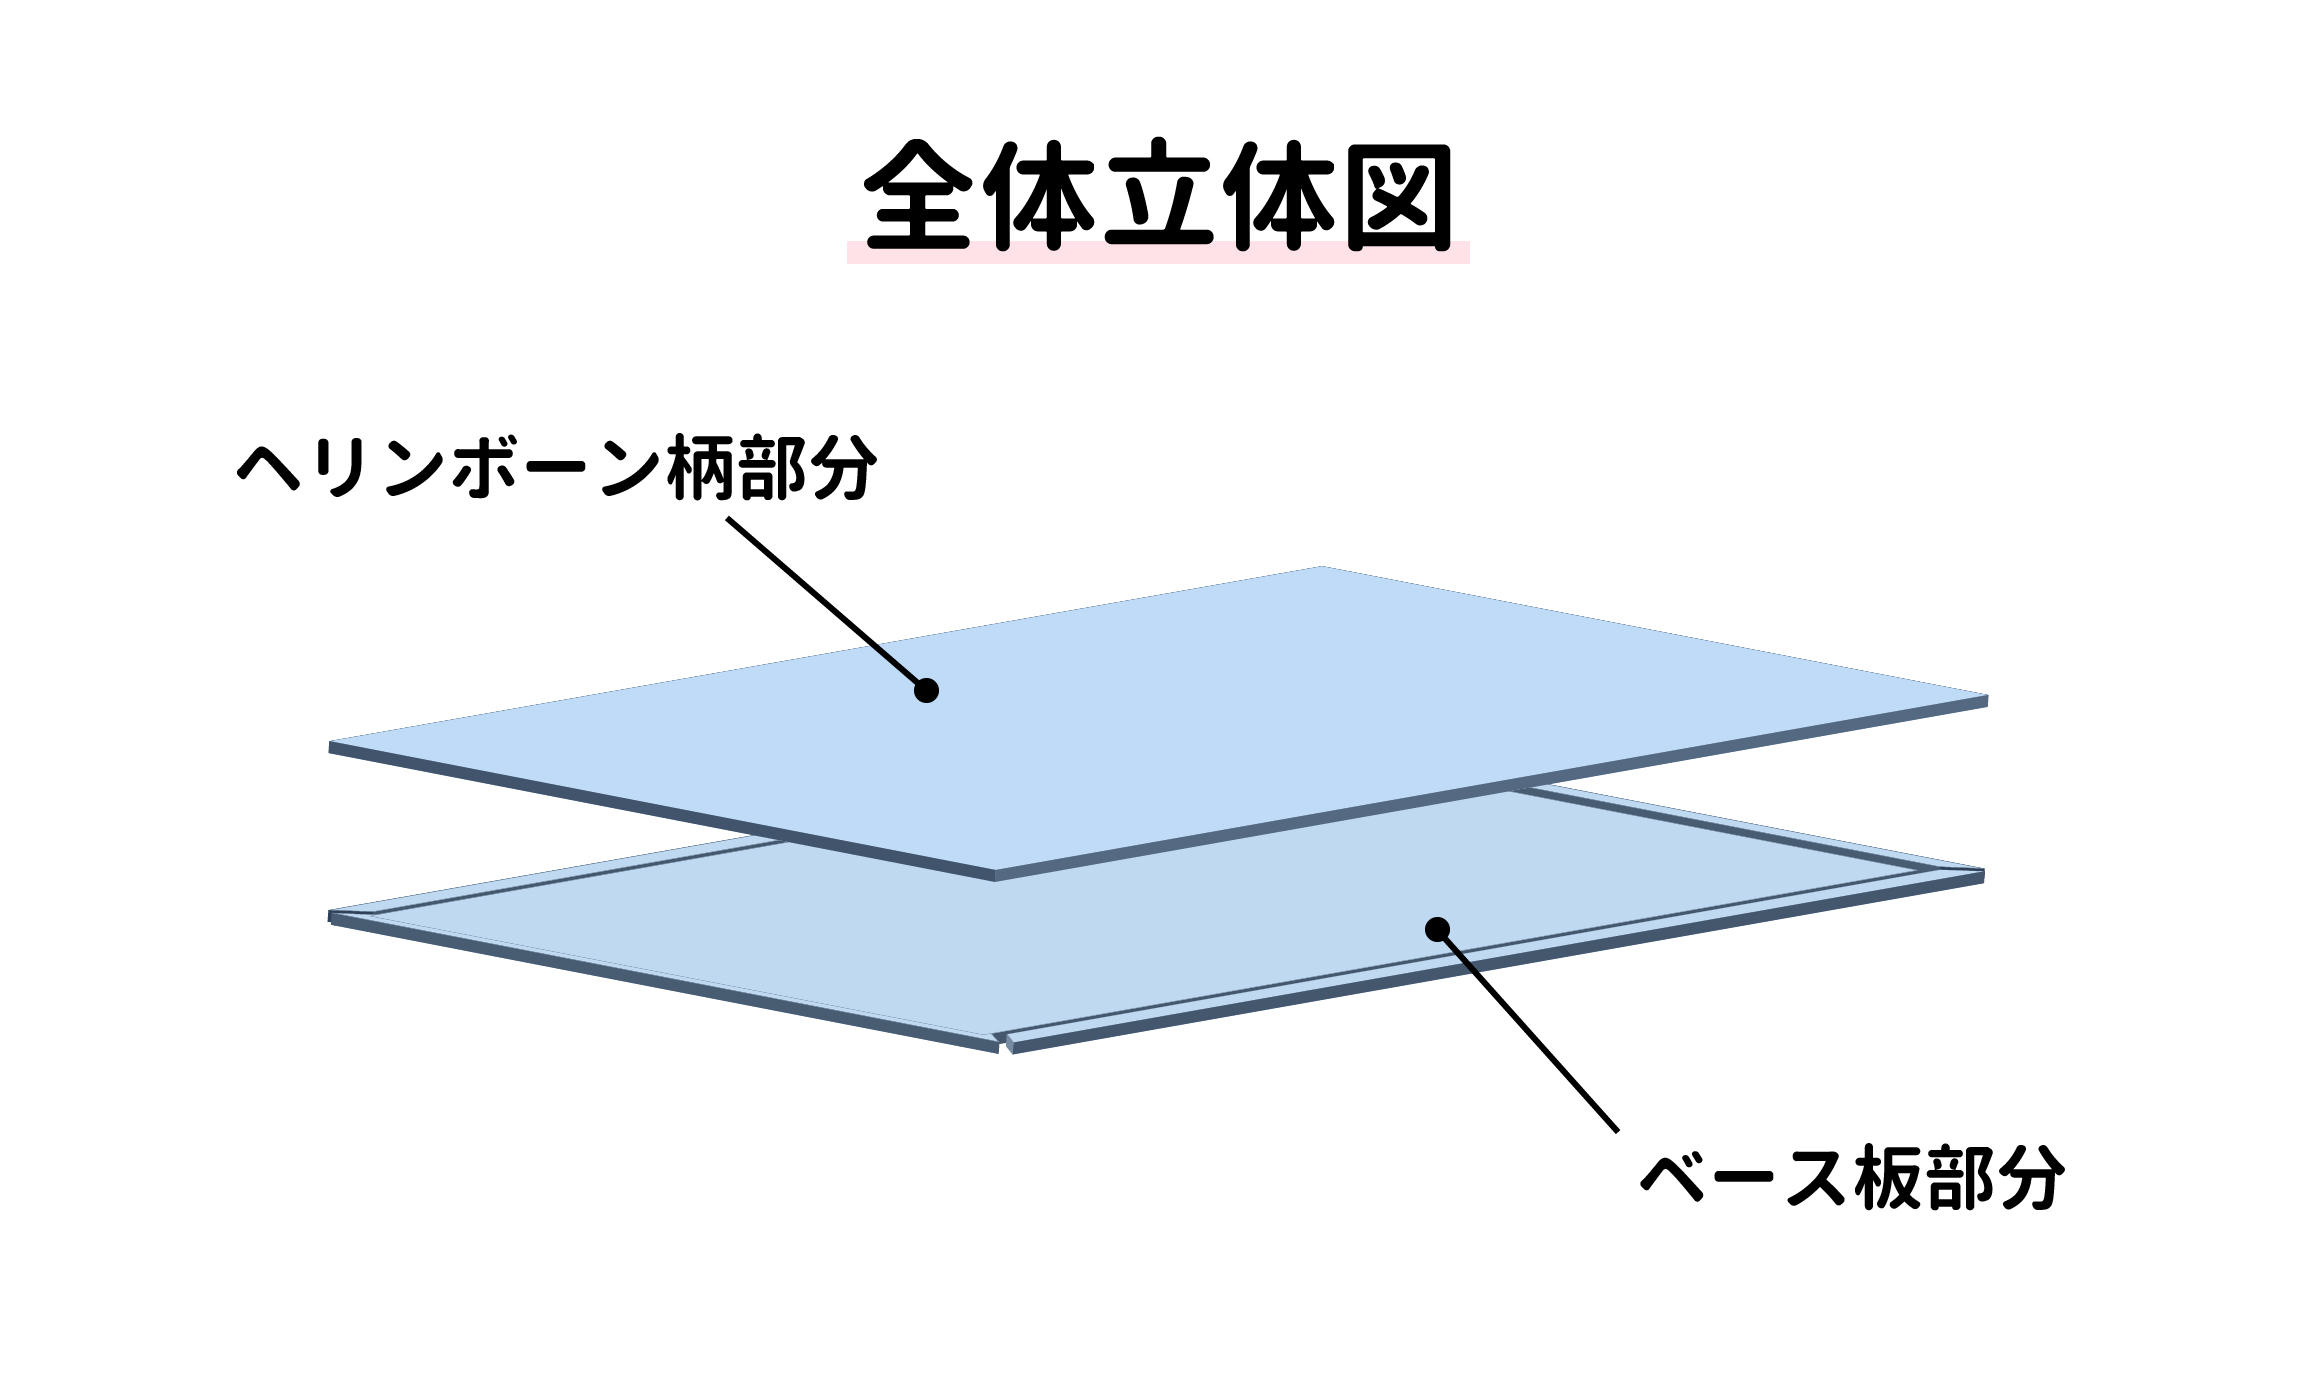 基本の全体立体図